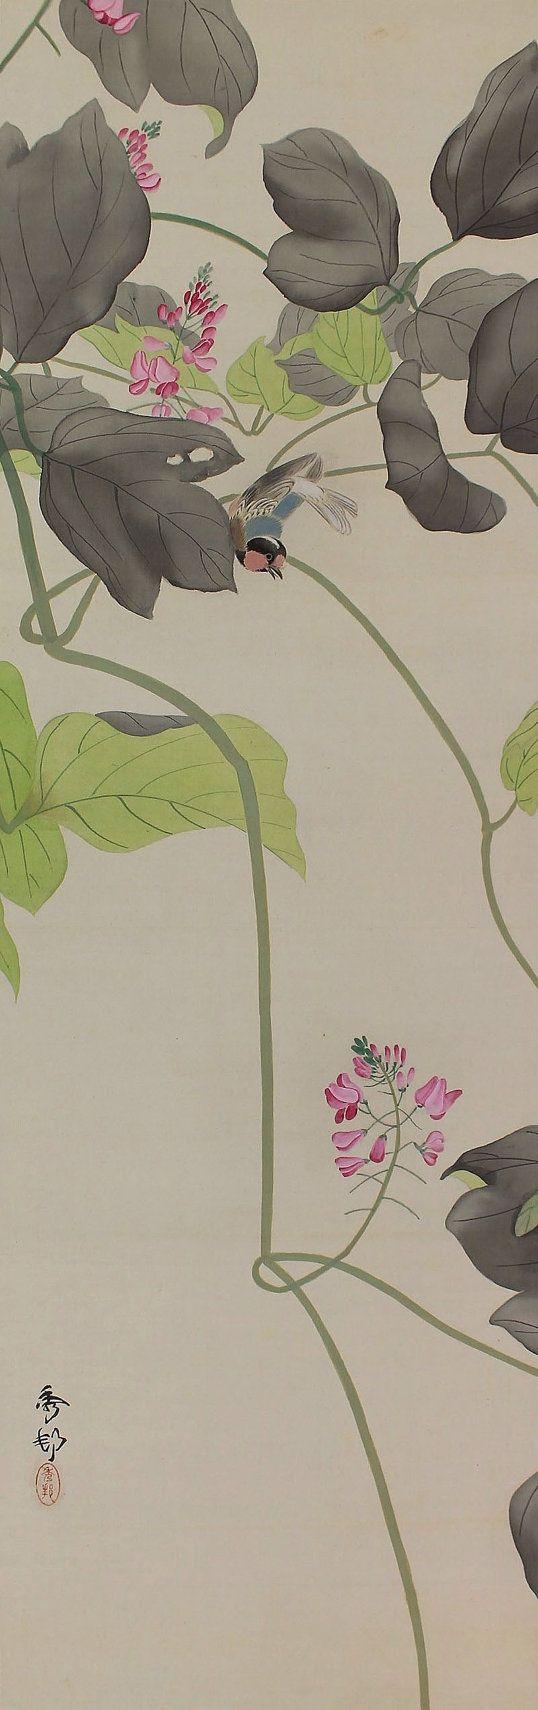 Bird and Flower. Japanese hanging scroll painting kakejiku.